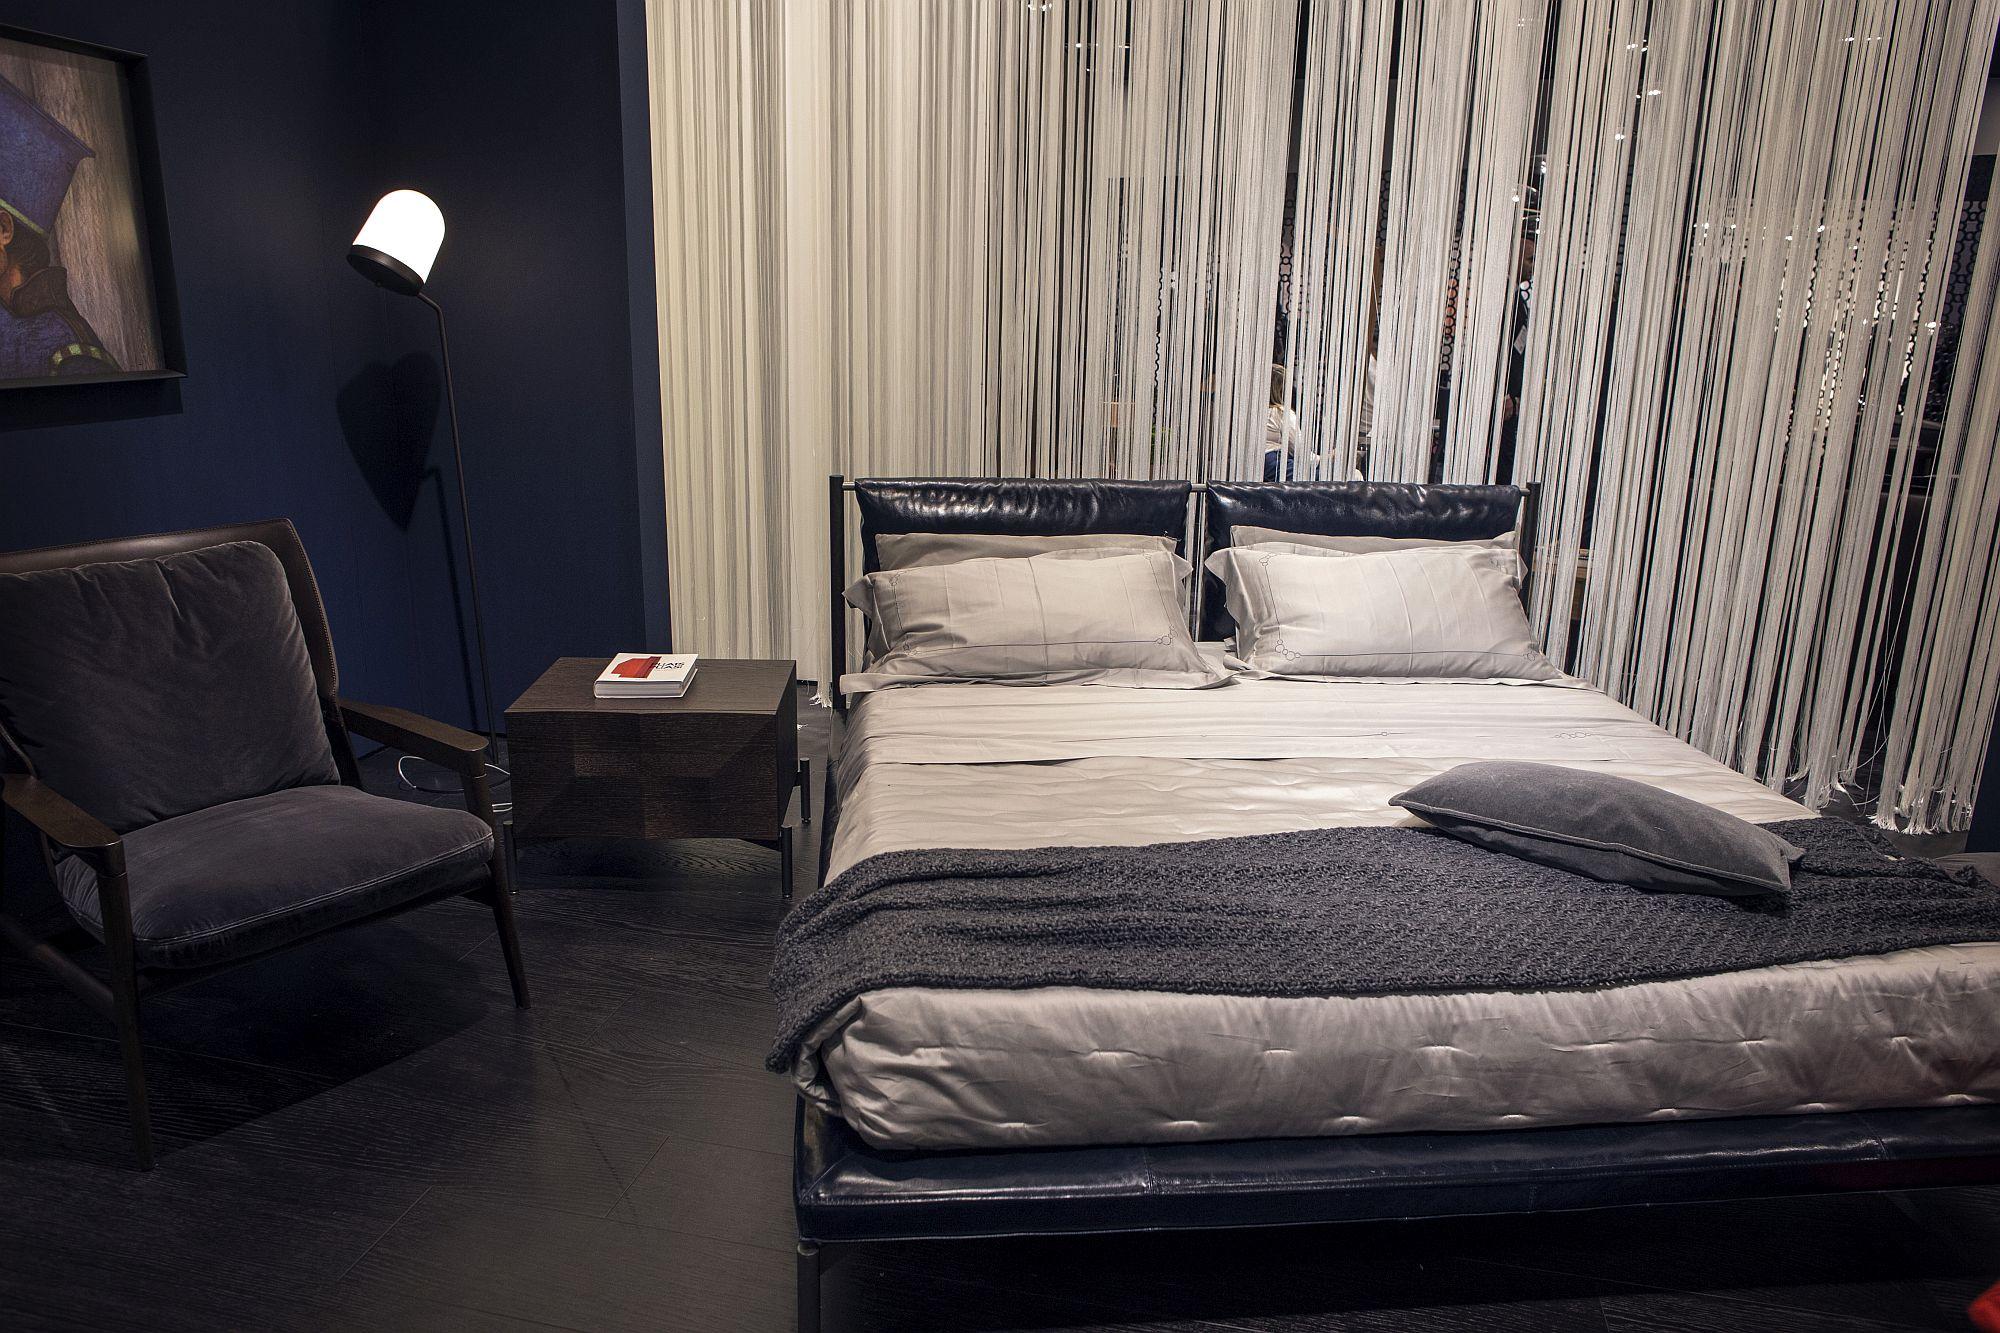 Contemporary-bedroom-with-an-unassuming-floor-lamp-in-the-corner